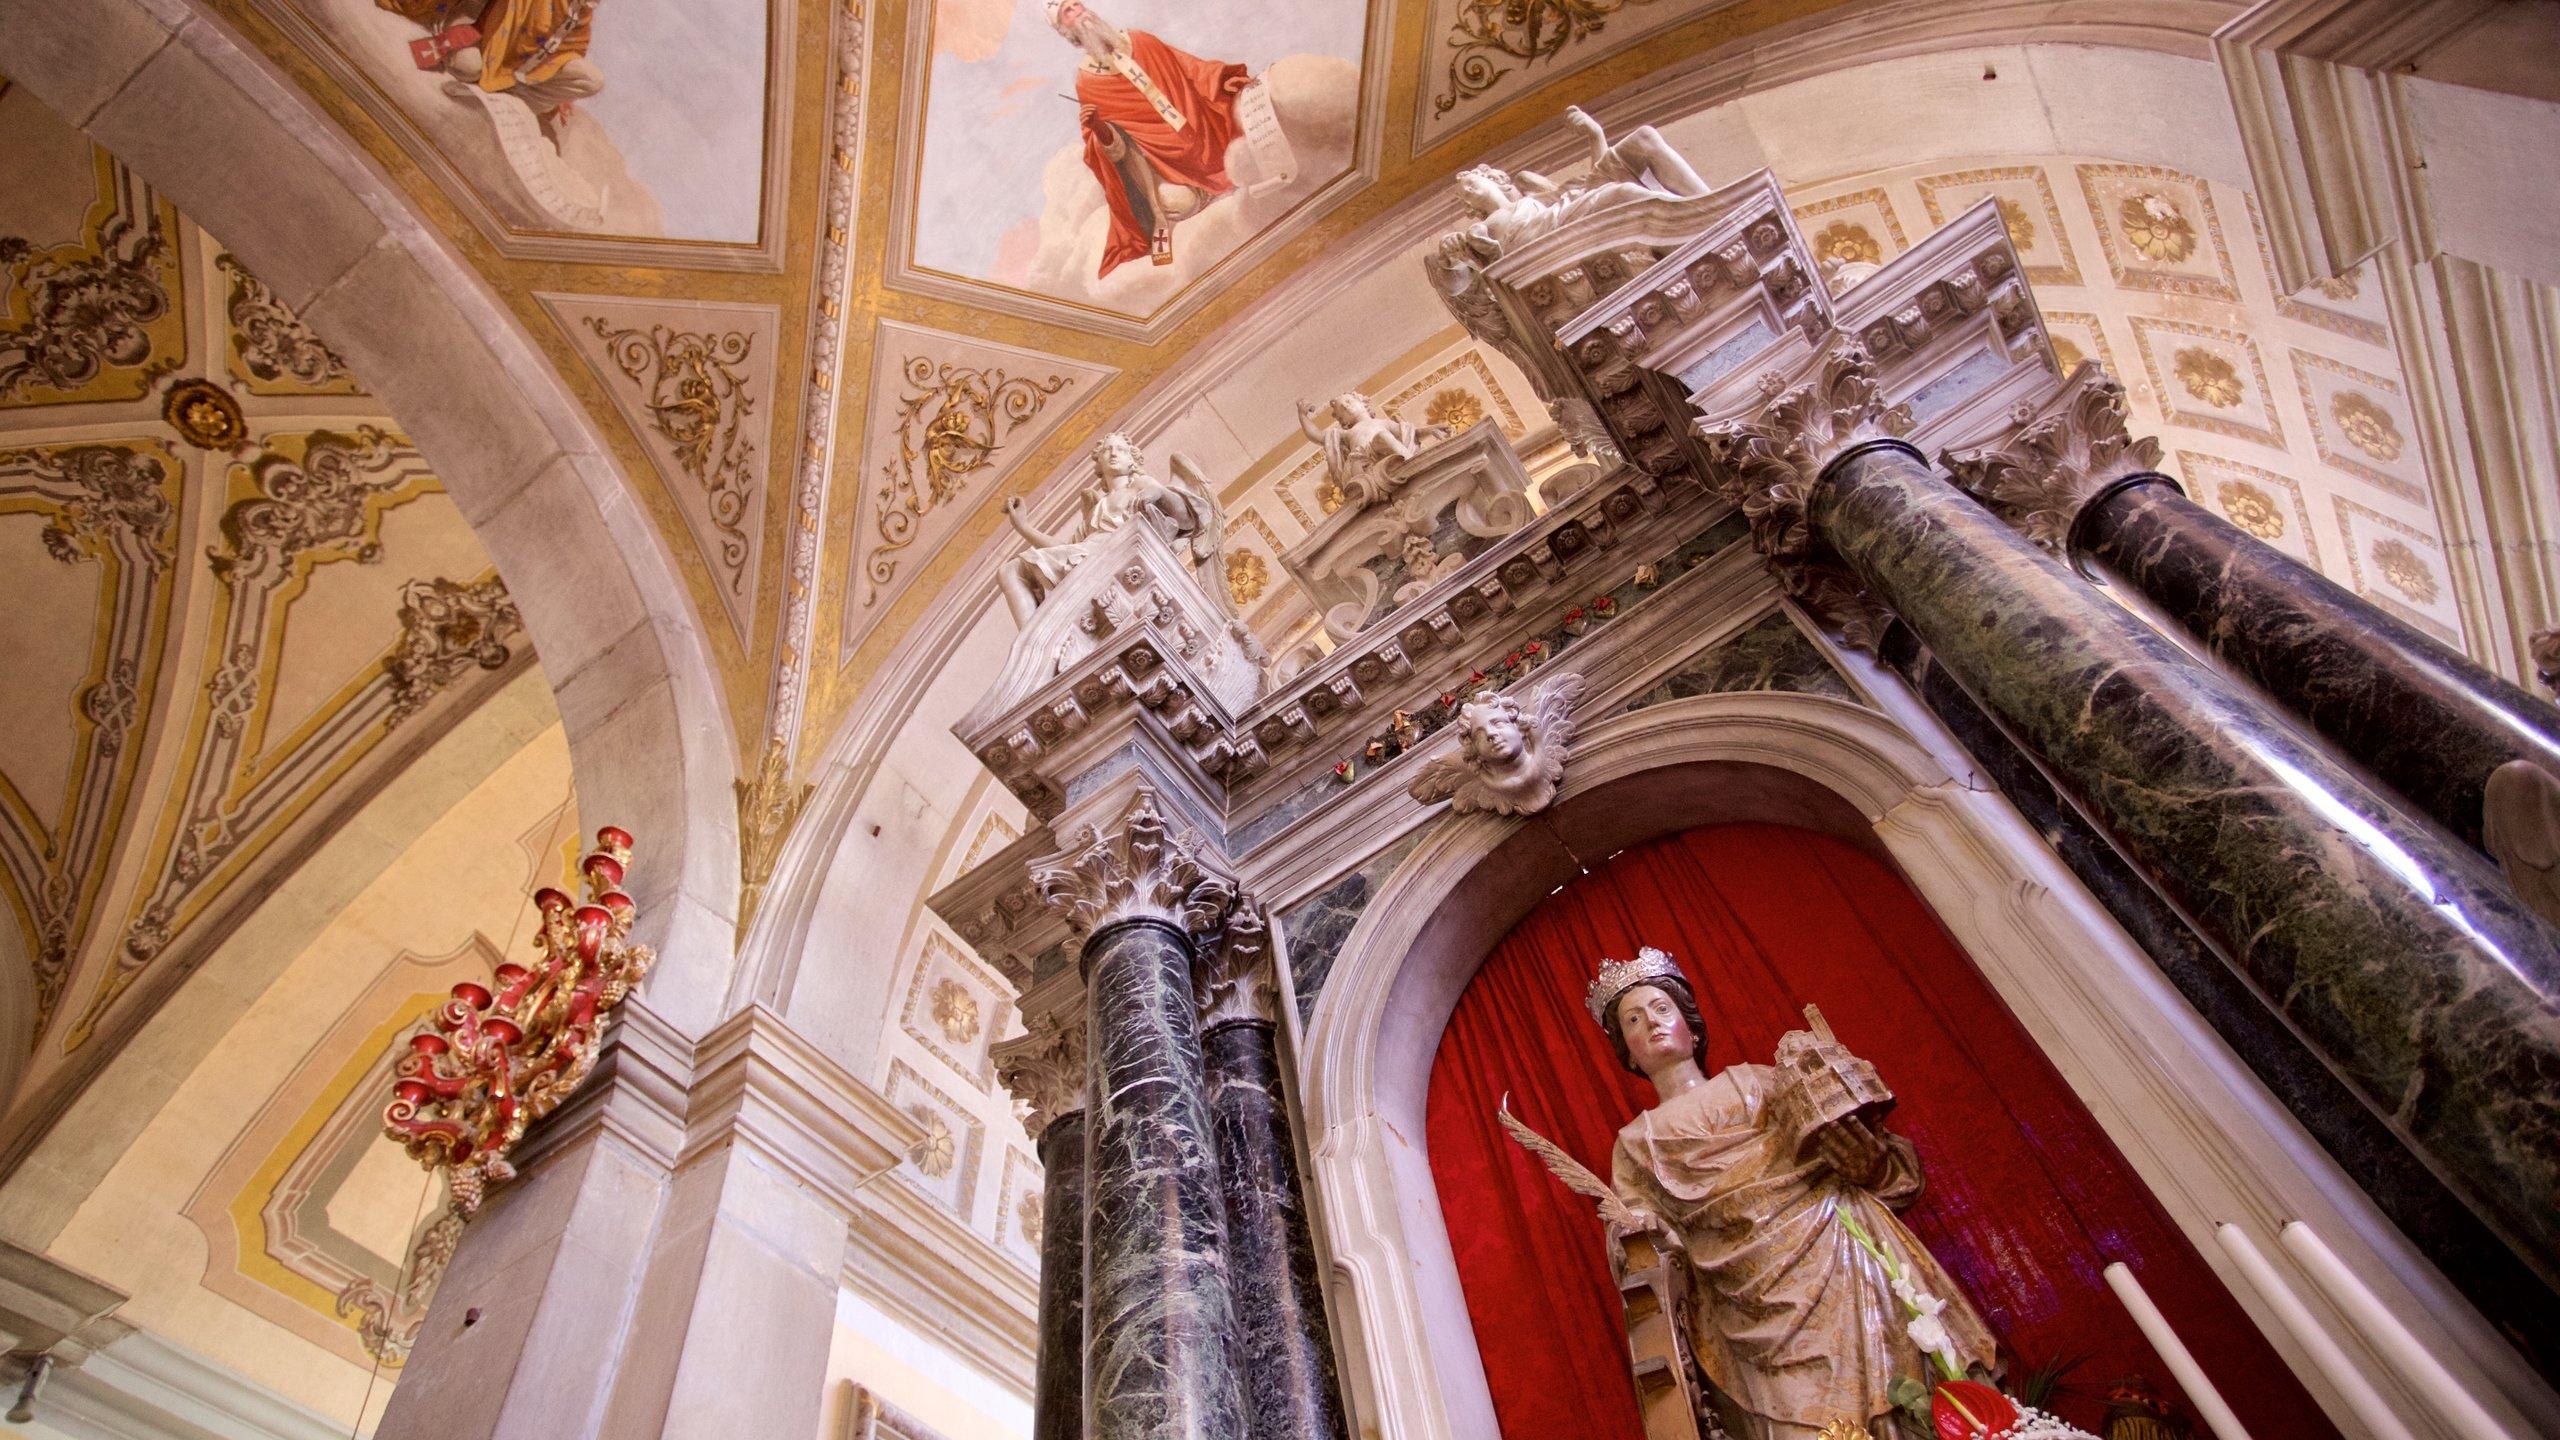 Kirche der Heiligen Euphemia, Rovinj, Istrien (Bezirk), Kroatien